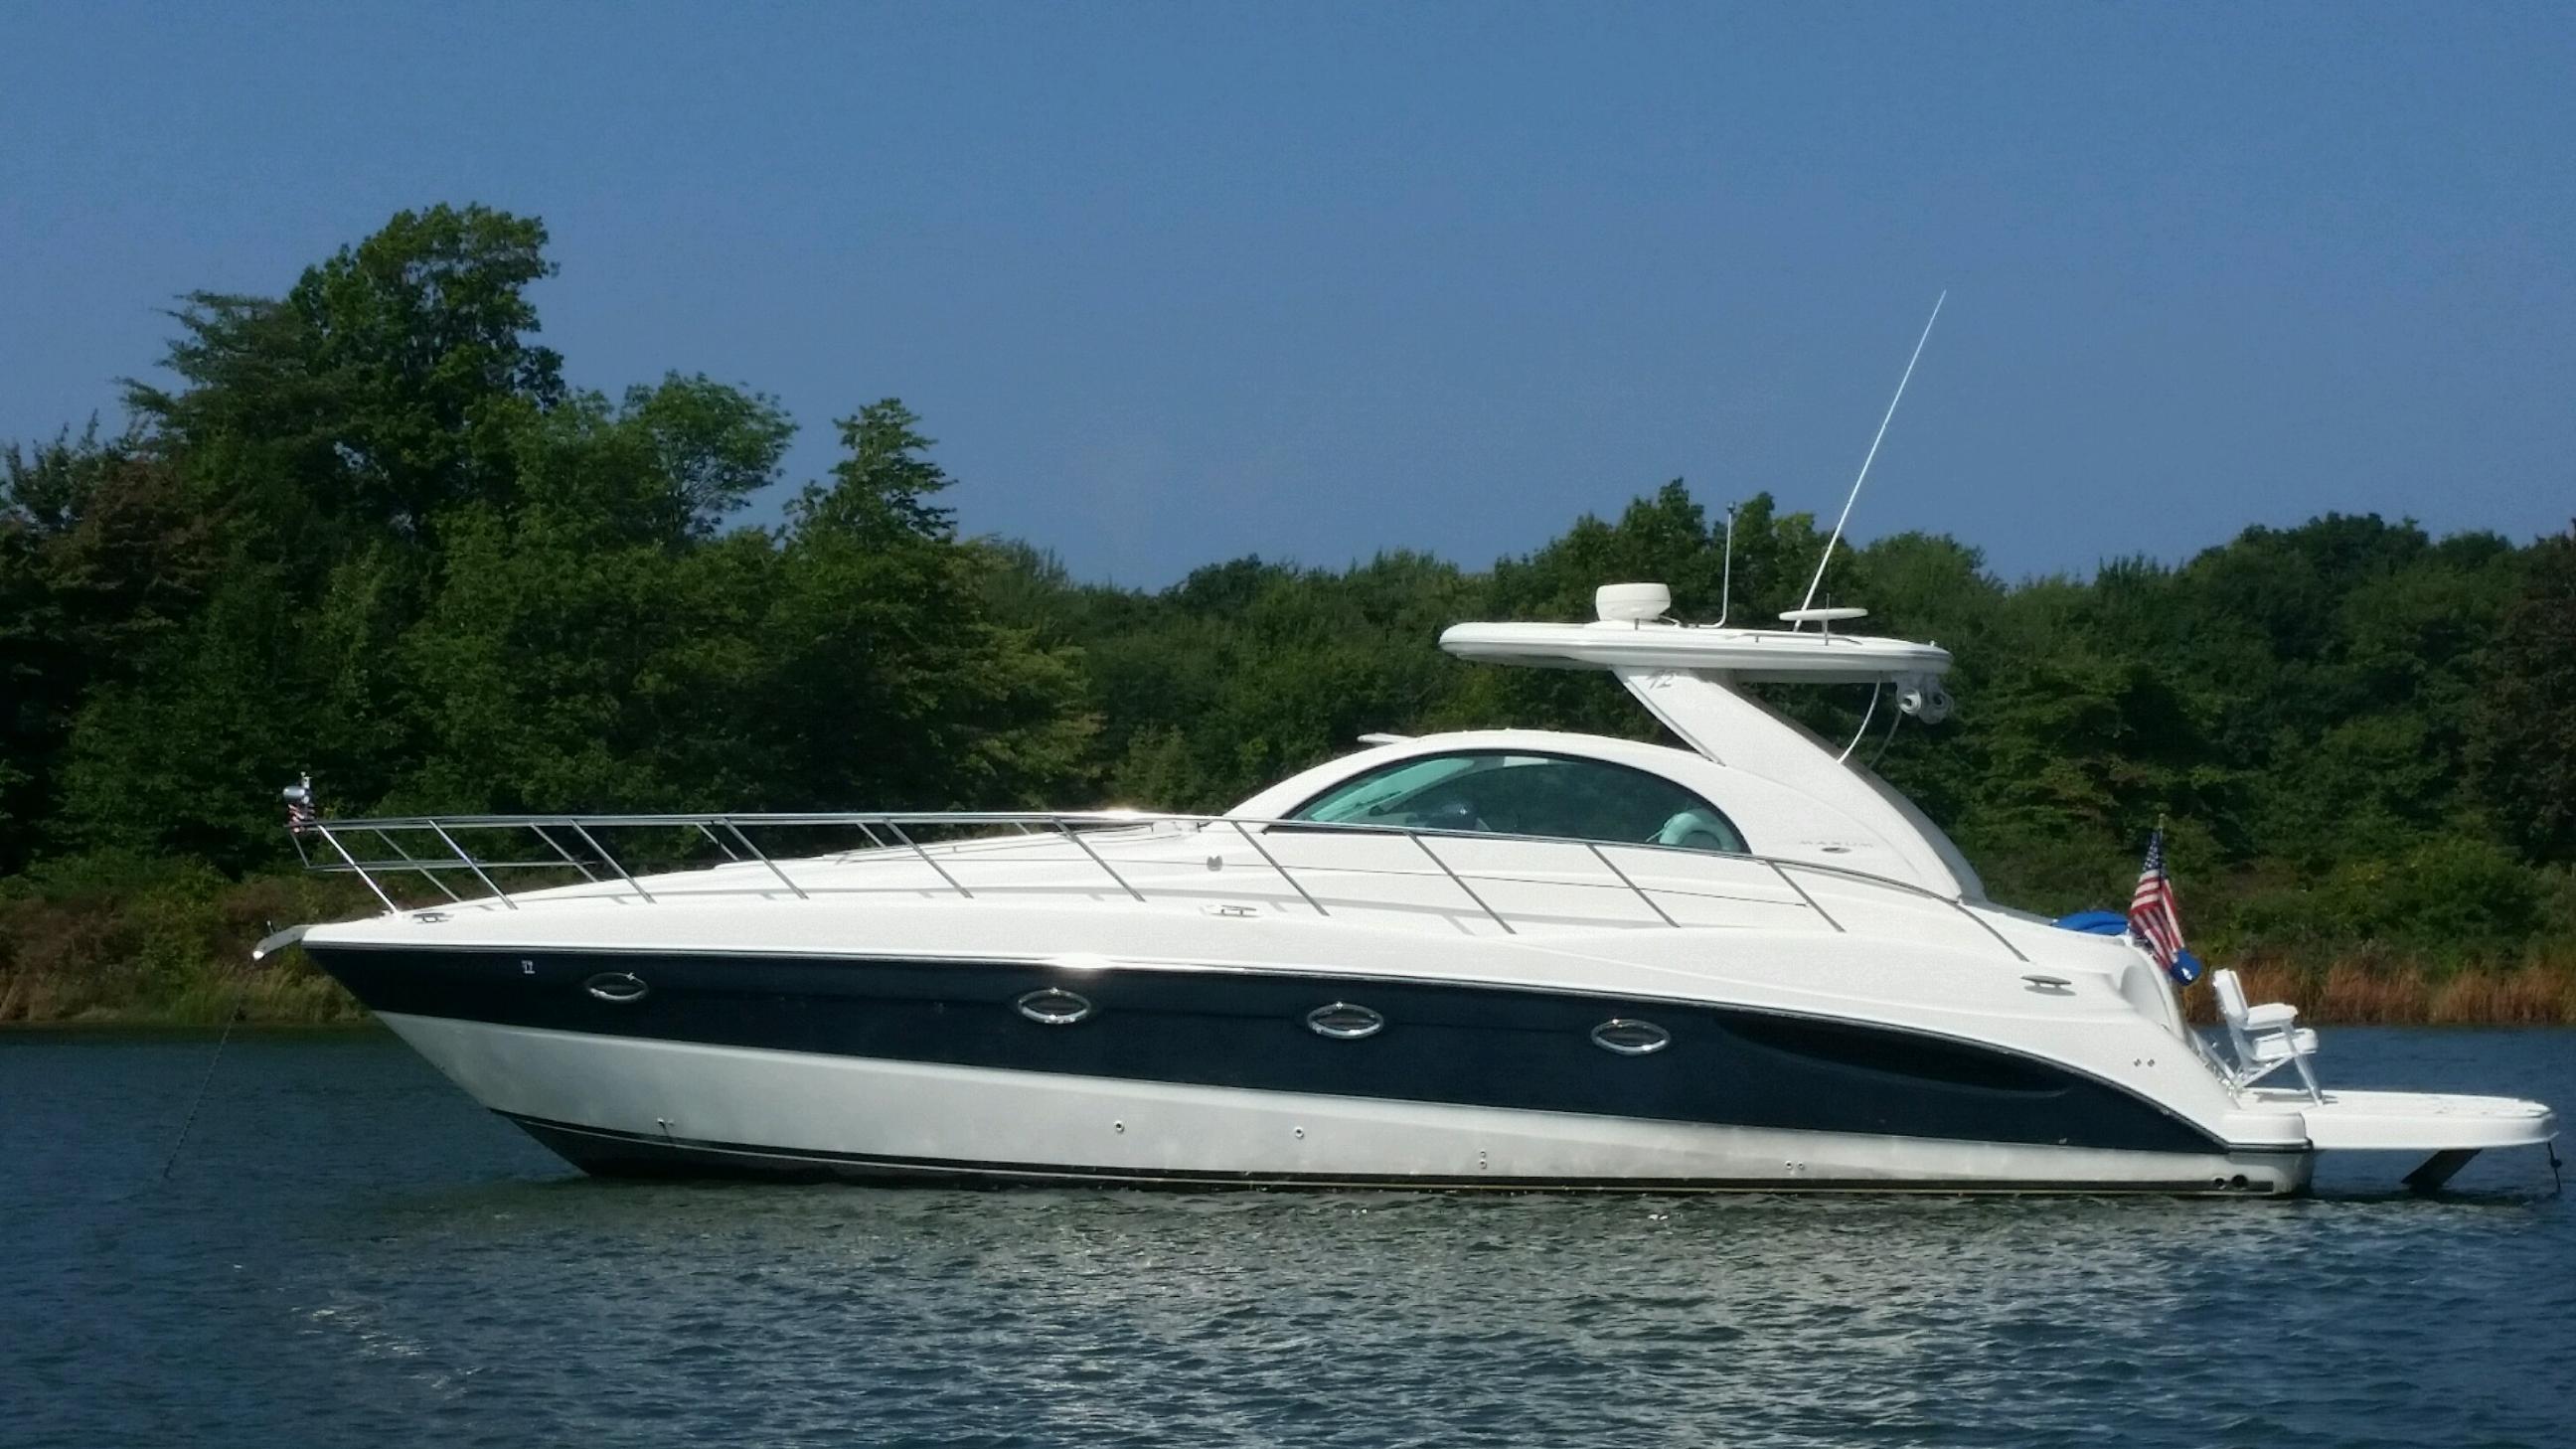 Used 2002 Maxum 42 Scr Hardtop, Erie, Pa - 16509 - BoatTrader.com